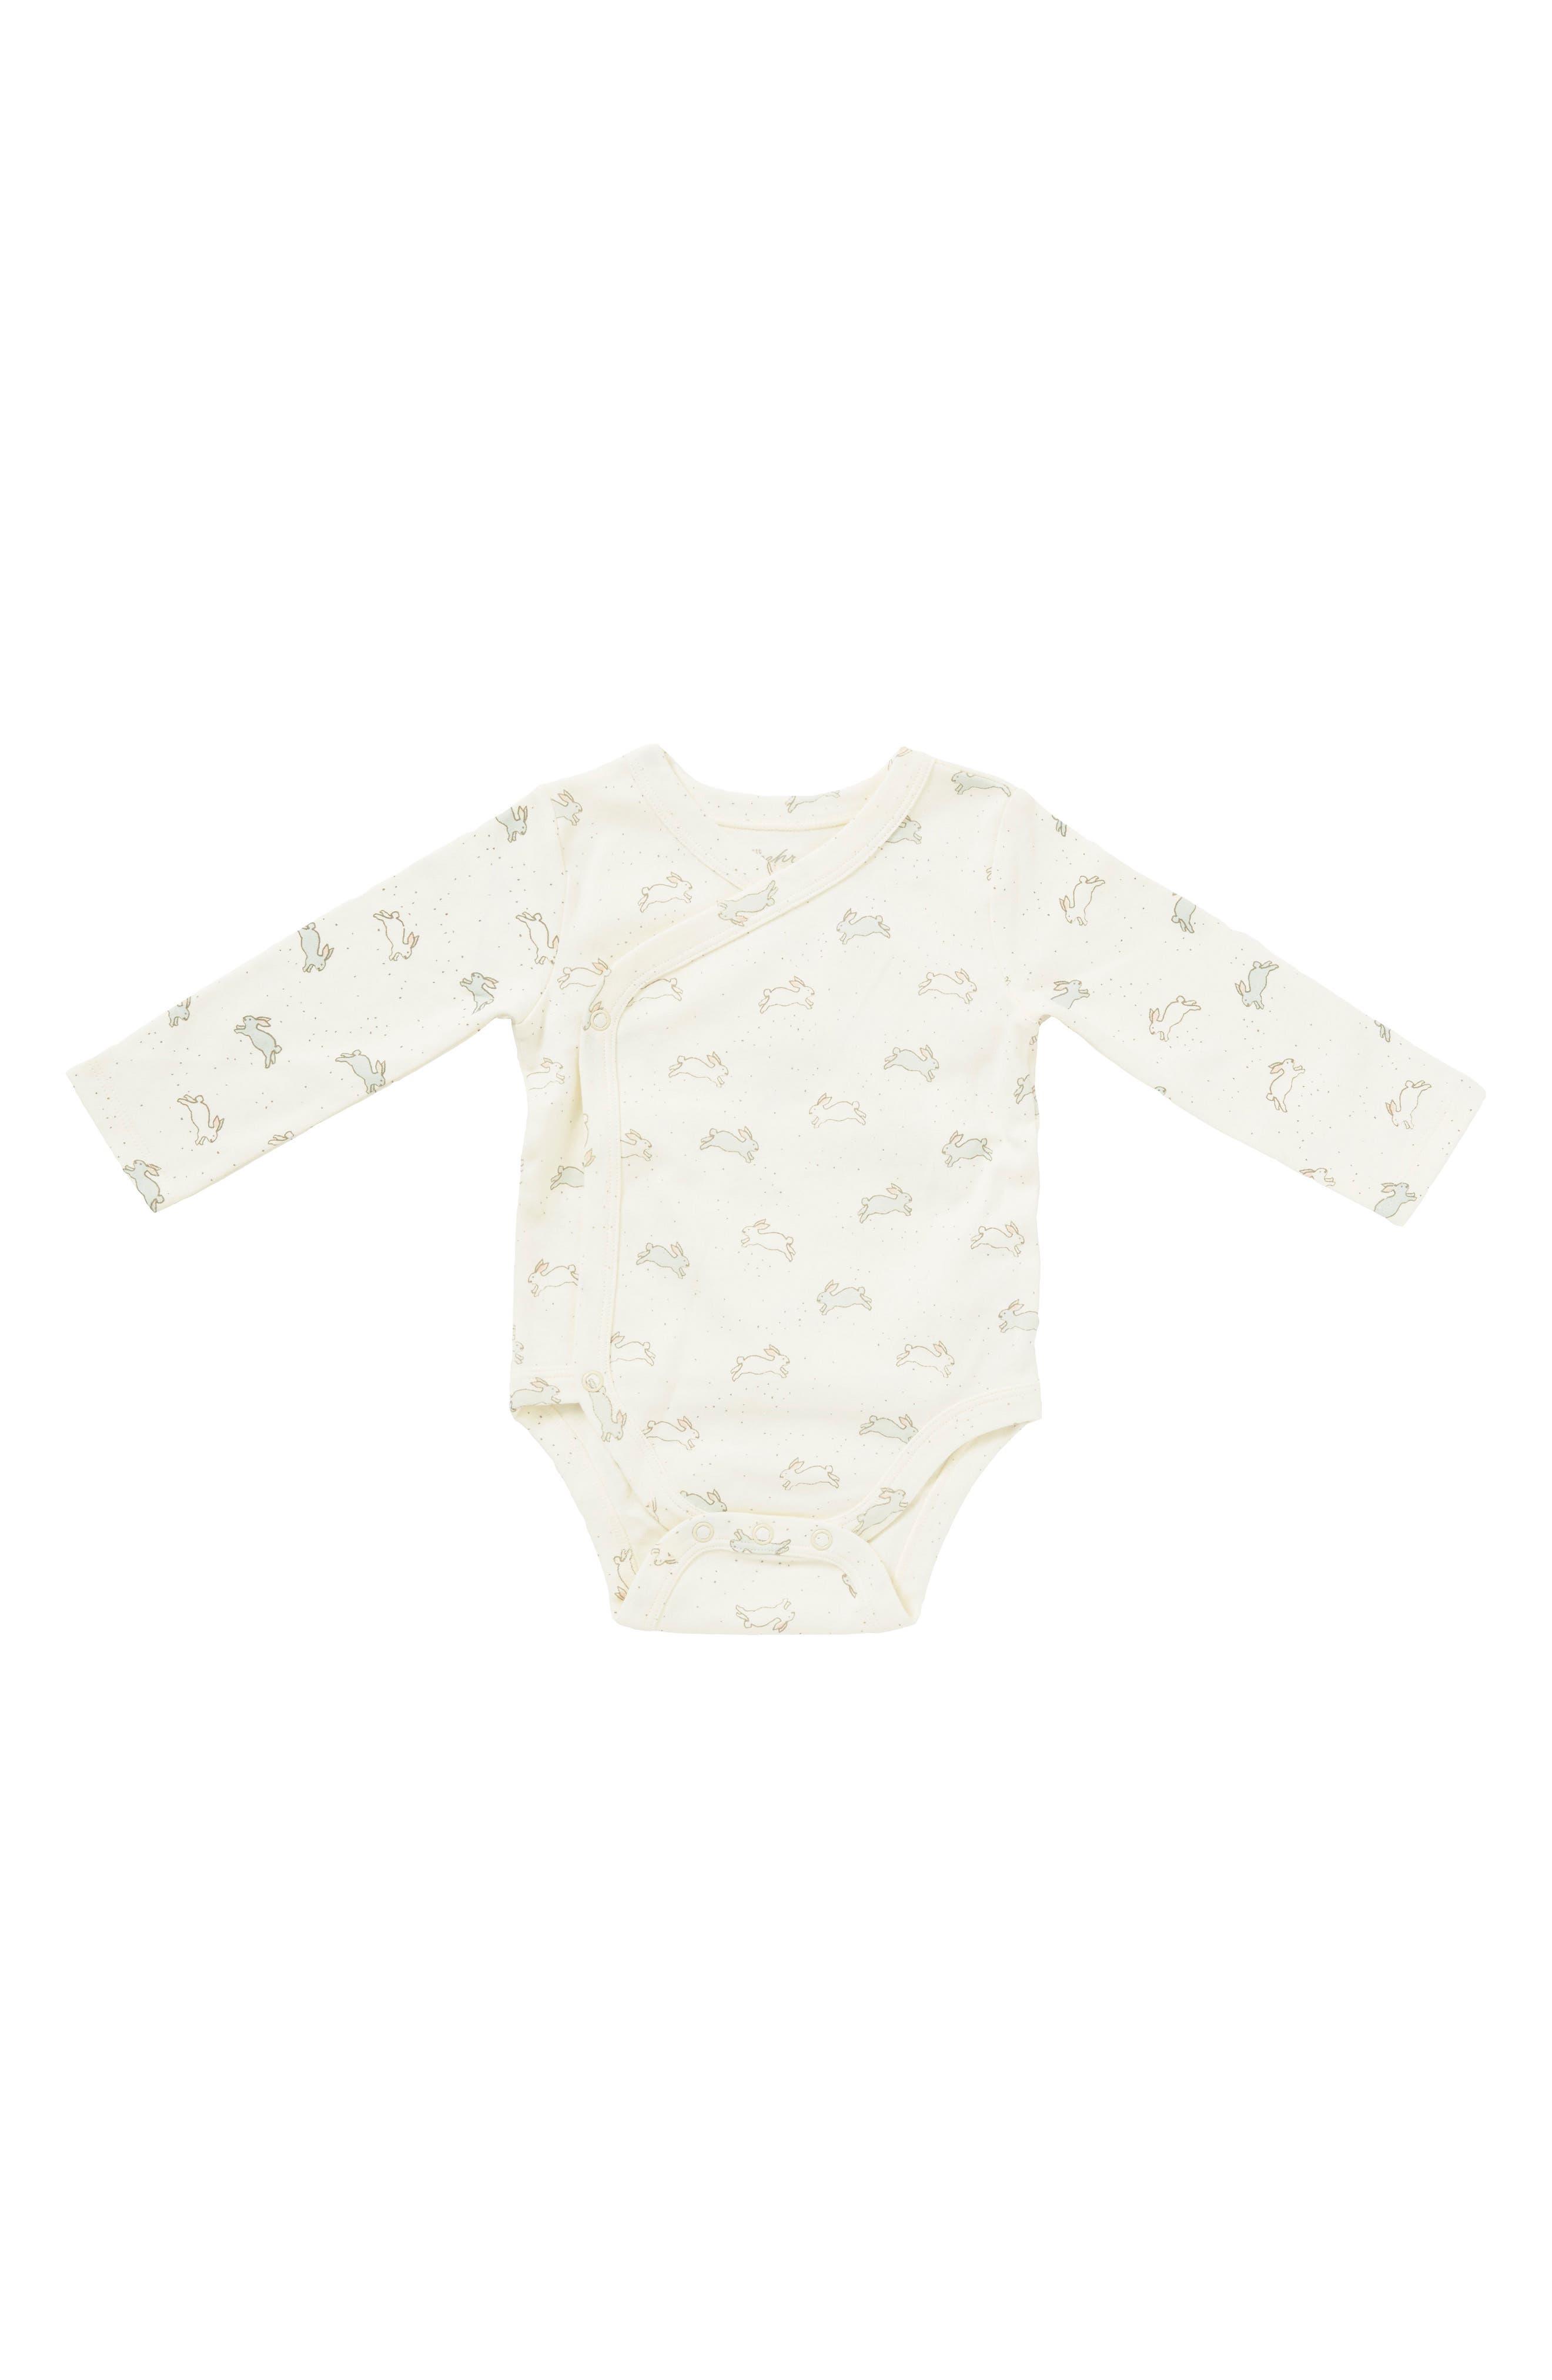 Main Image - Petit Pehr Tiny Bunny Bodysuit (Baby)